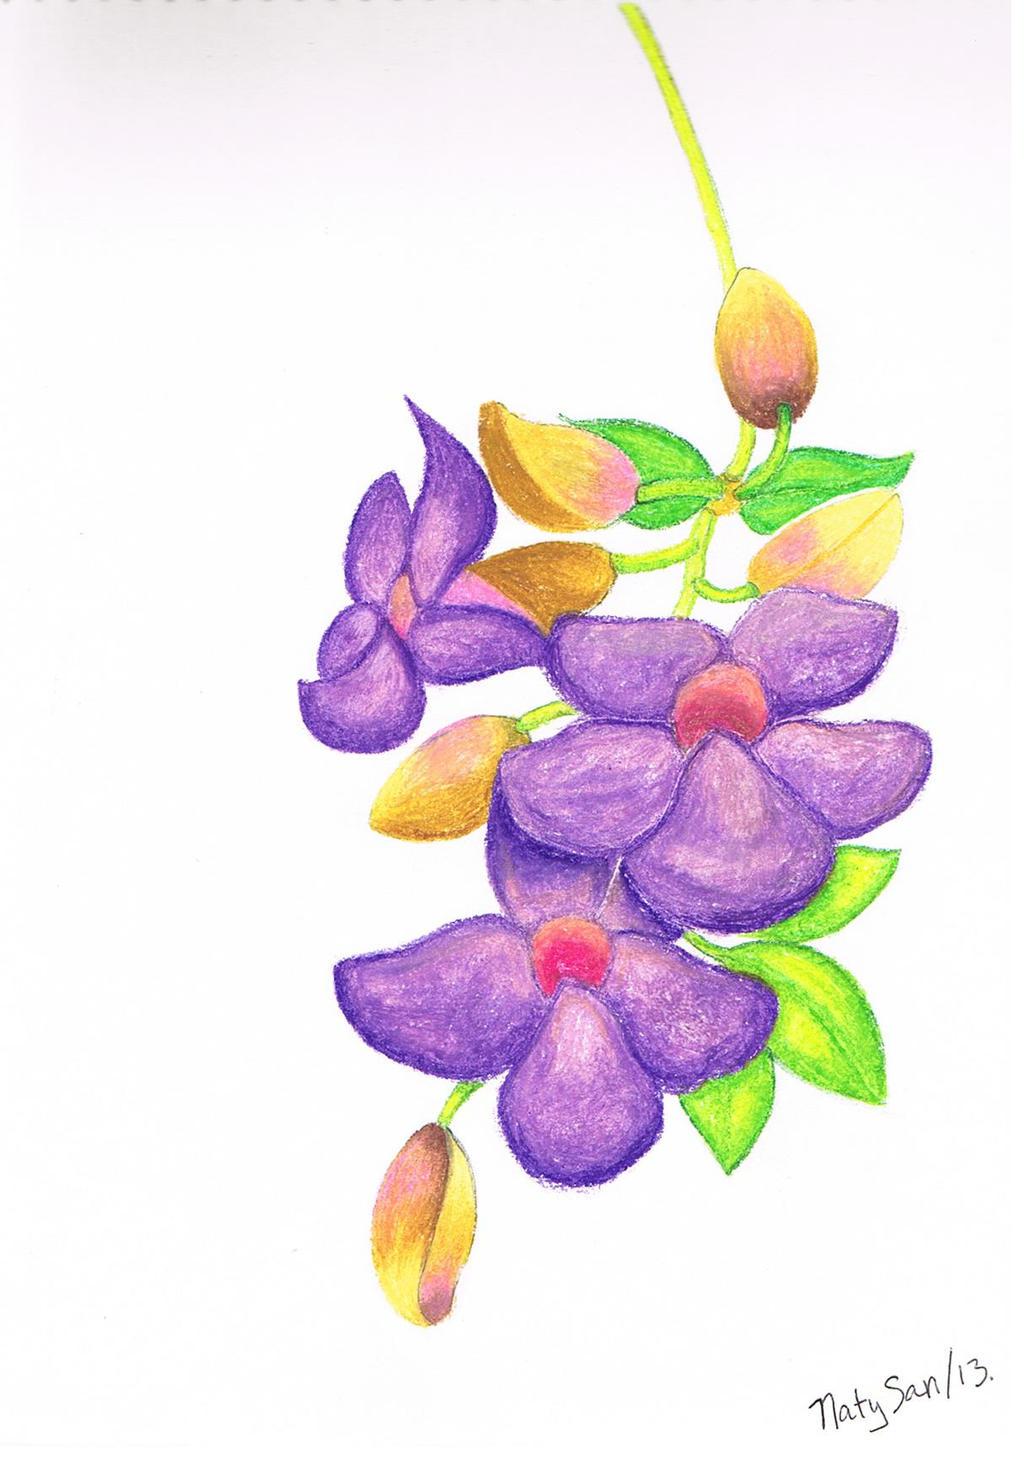 Just flowers by NataLeeSan on DeviantArt